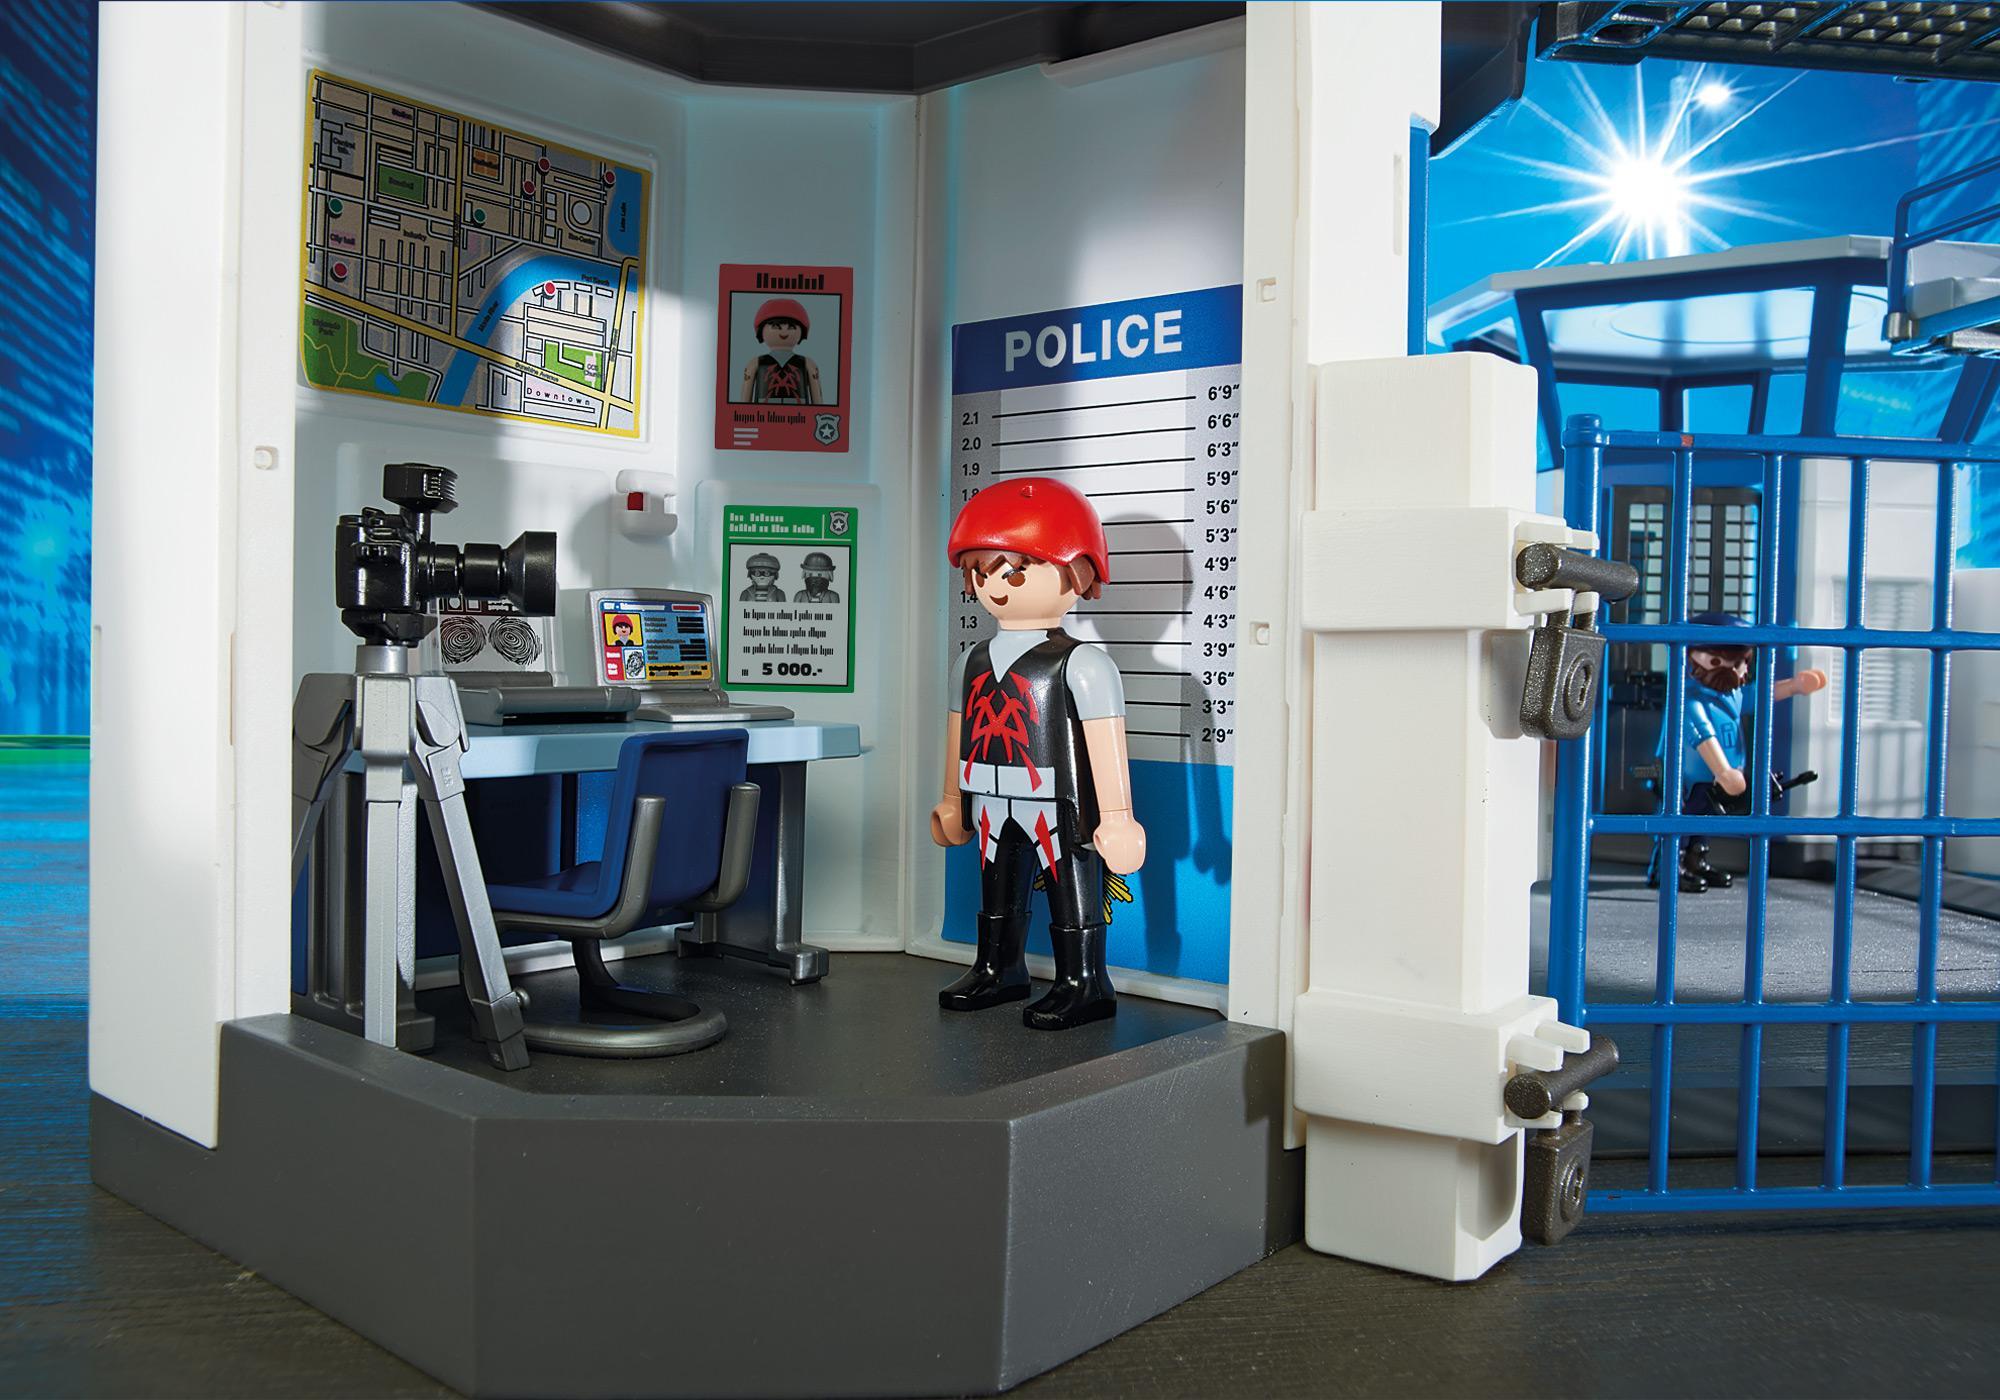 http://media.playmobil.com/i/playmobil/6919_product_extra2/Int. Polizei-Kommandozentrale mit Gefängnis